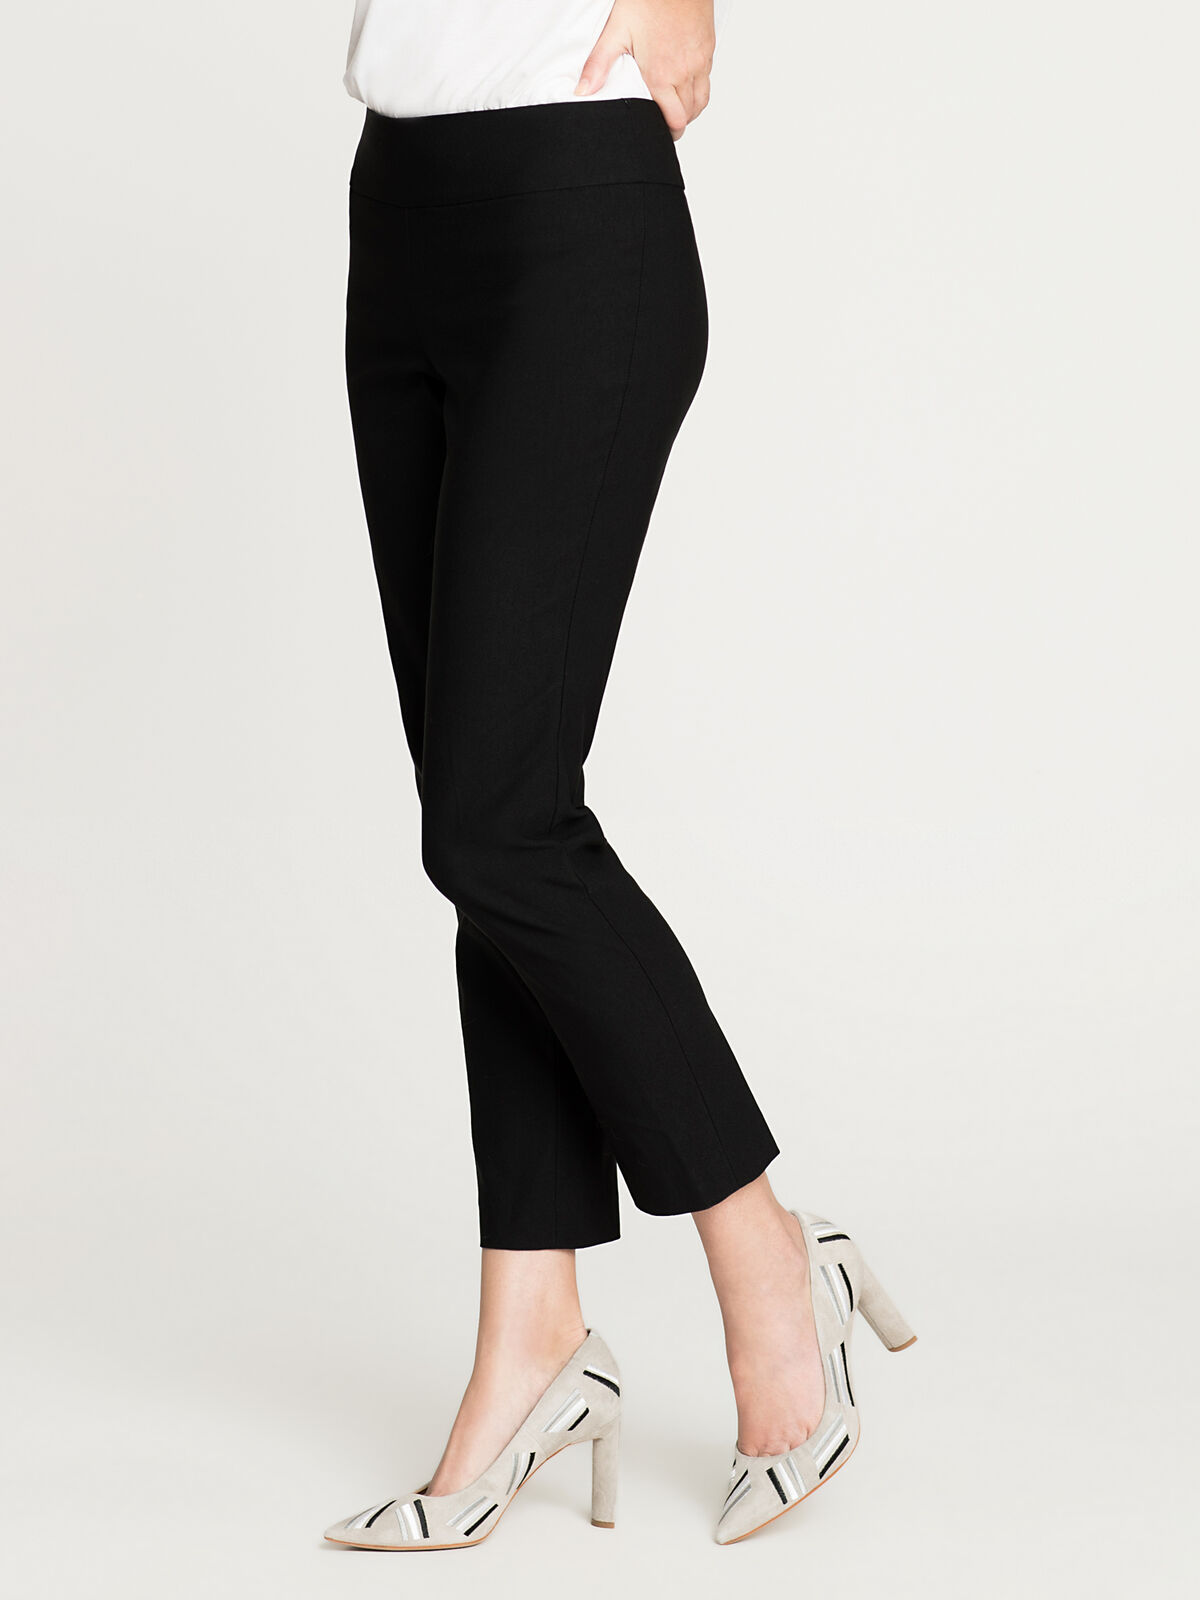 Ankle Wonderstretch Pant